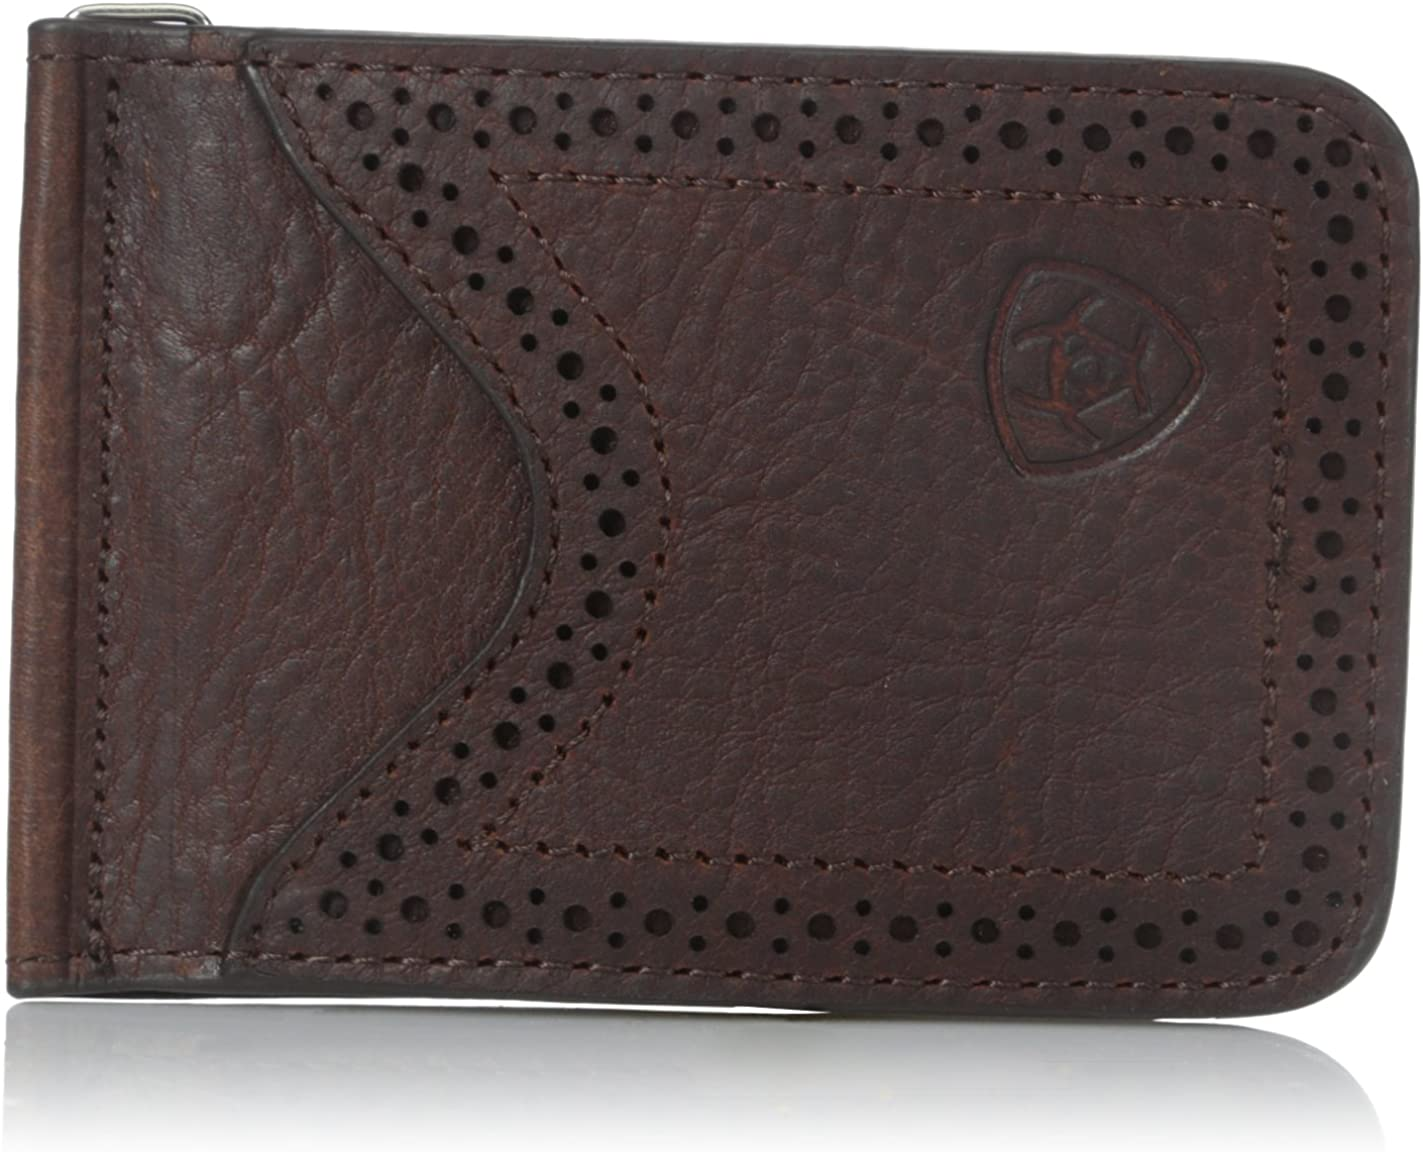 Ariat Men's Boot Vent Money Clip Copper Wallet